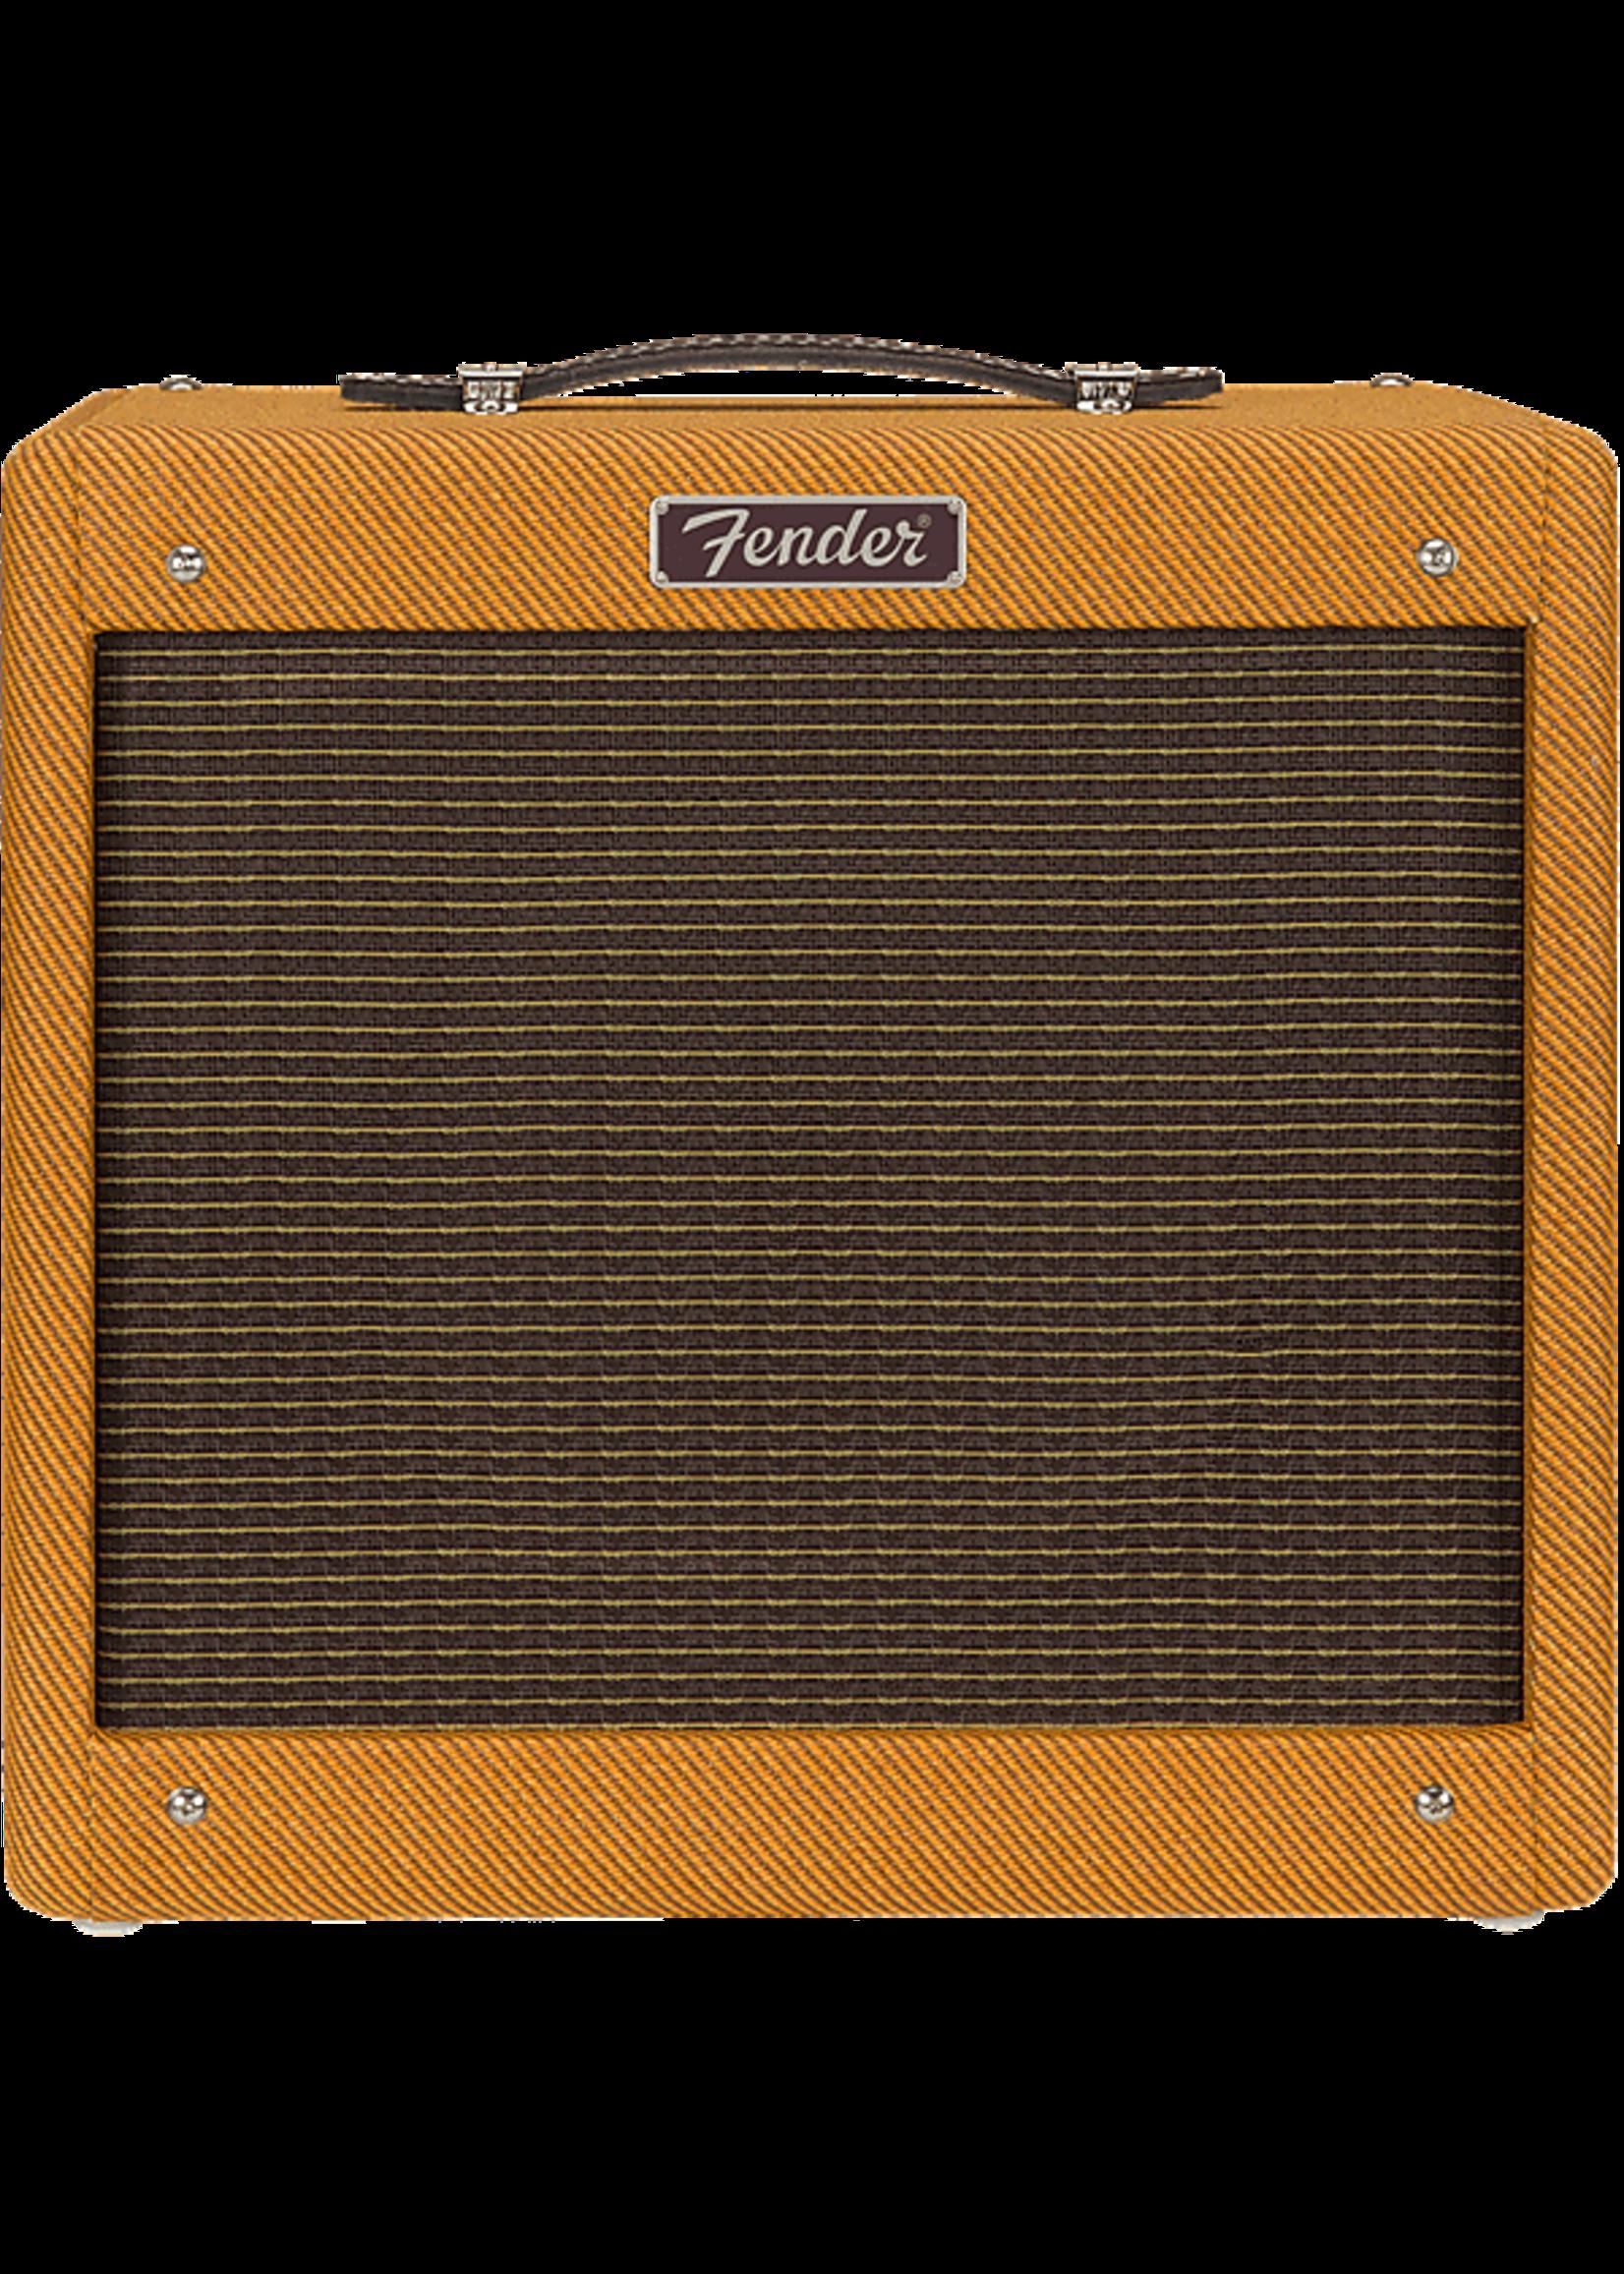 Fender Fender Pro Junior™ IV, Lacquered Tweed, 120V